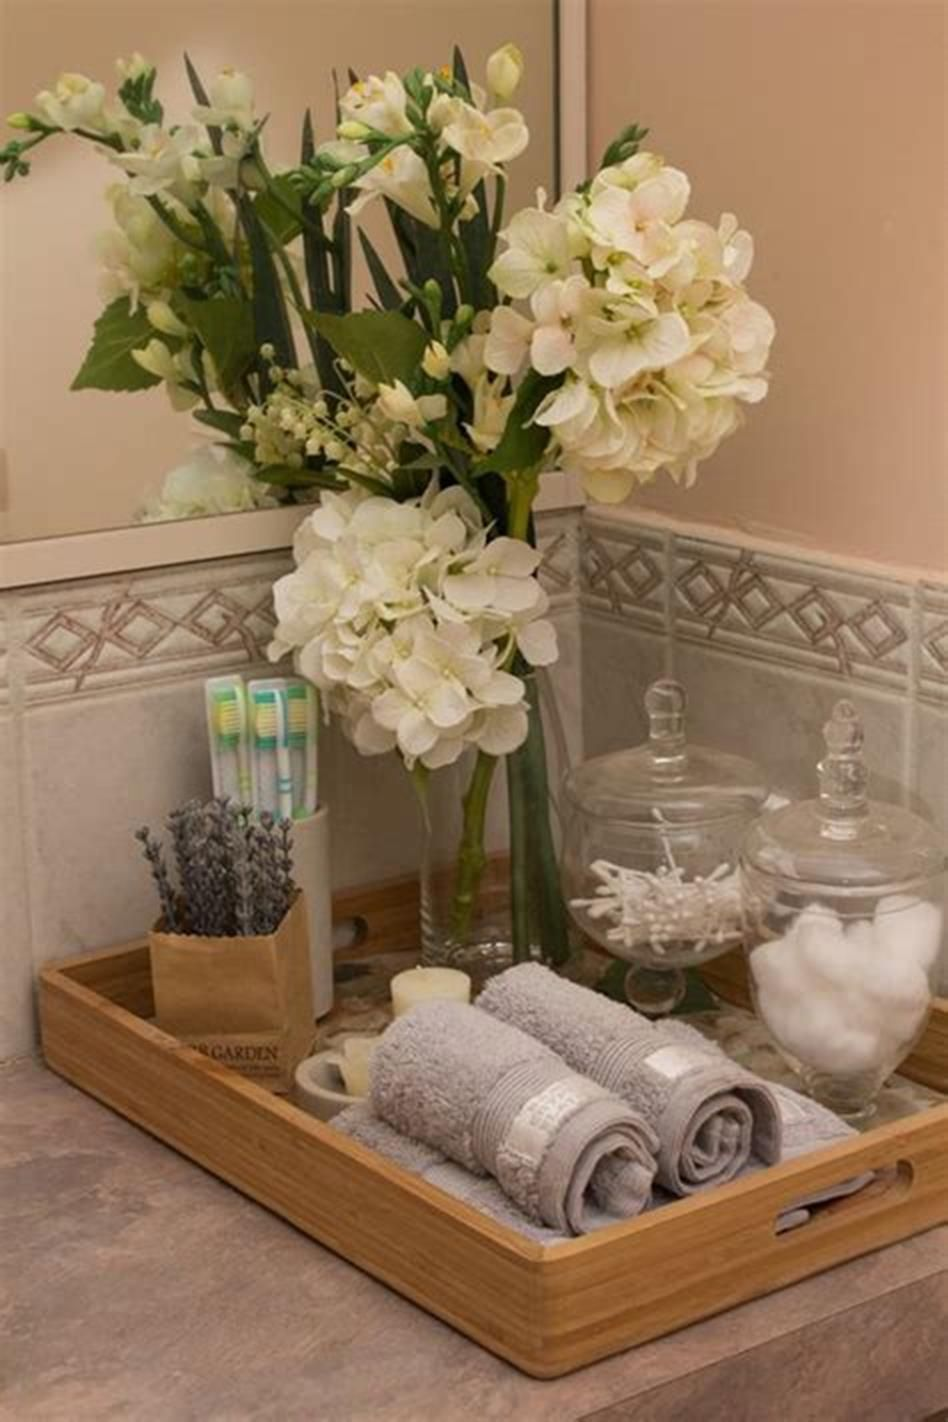 Bathroom Vanity Tray